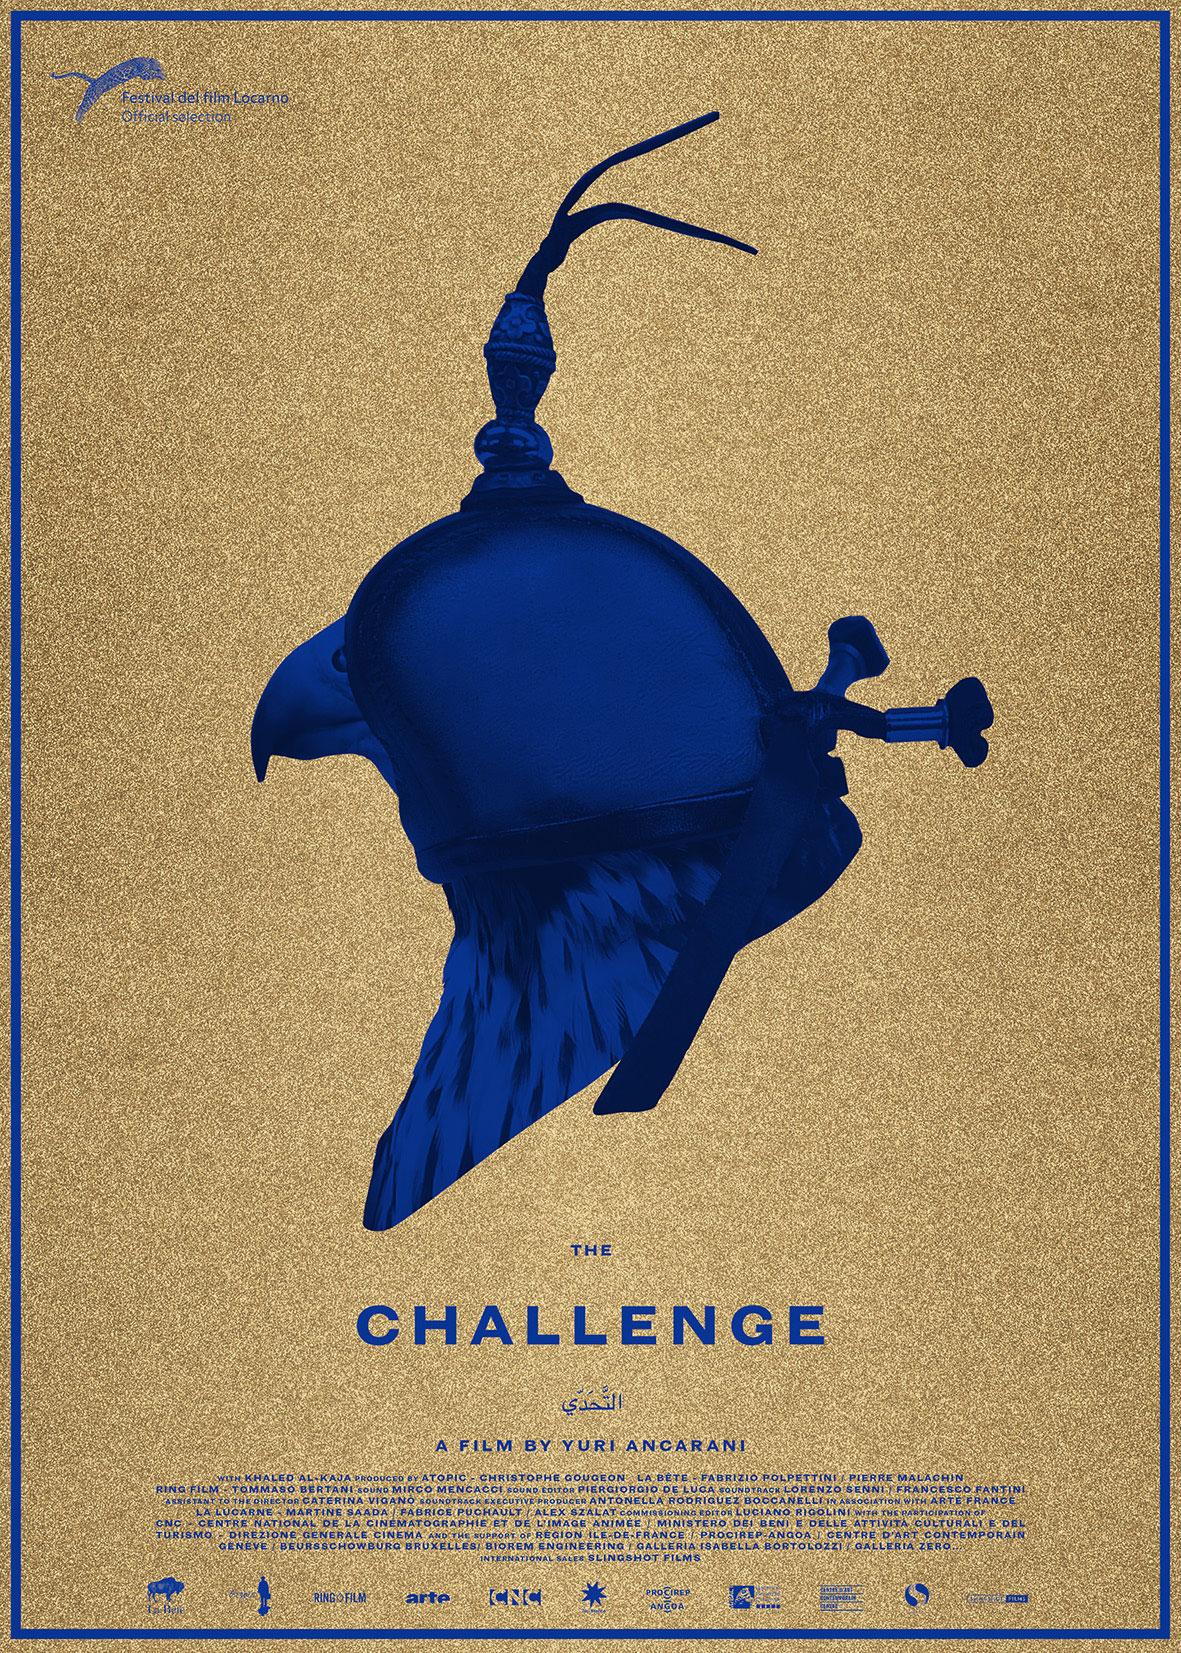 The Challenge by Yuri Ancarani, film poster © Yuri Ancarani.